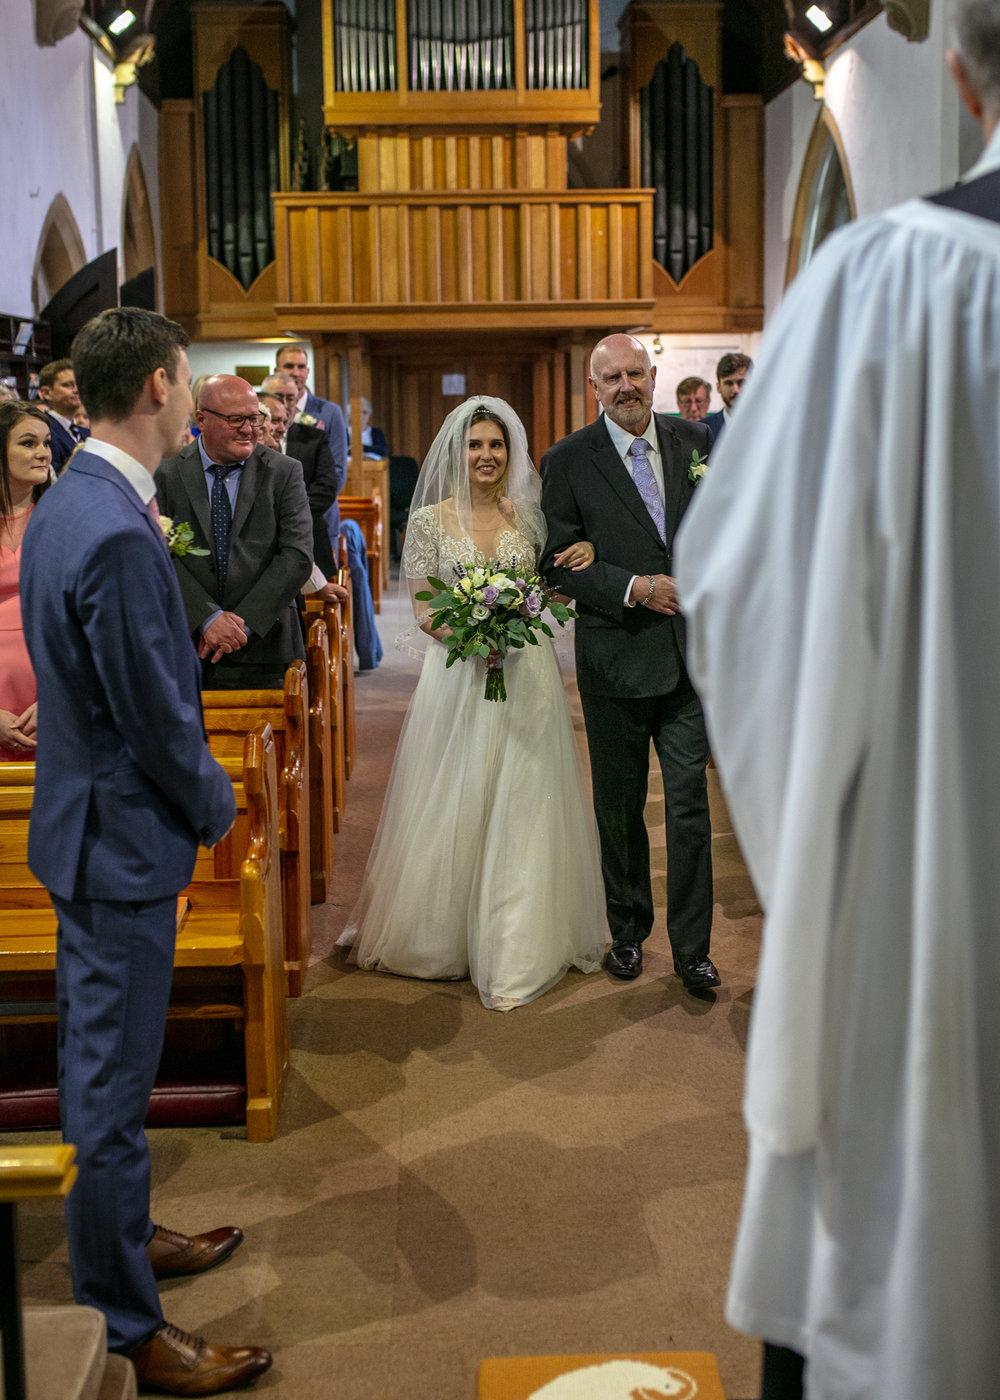 Charringworth-Manor-Wedding-Photography05.jpg